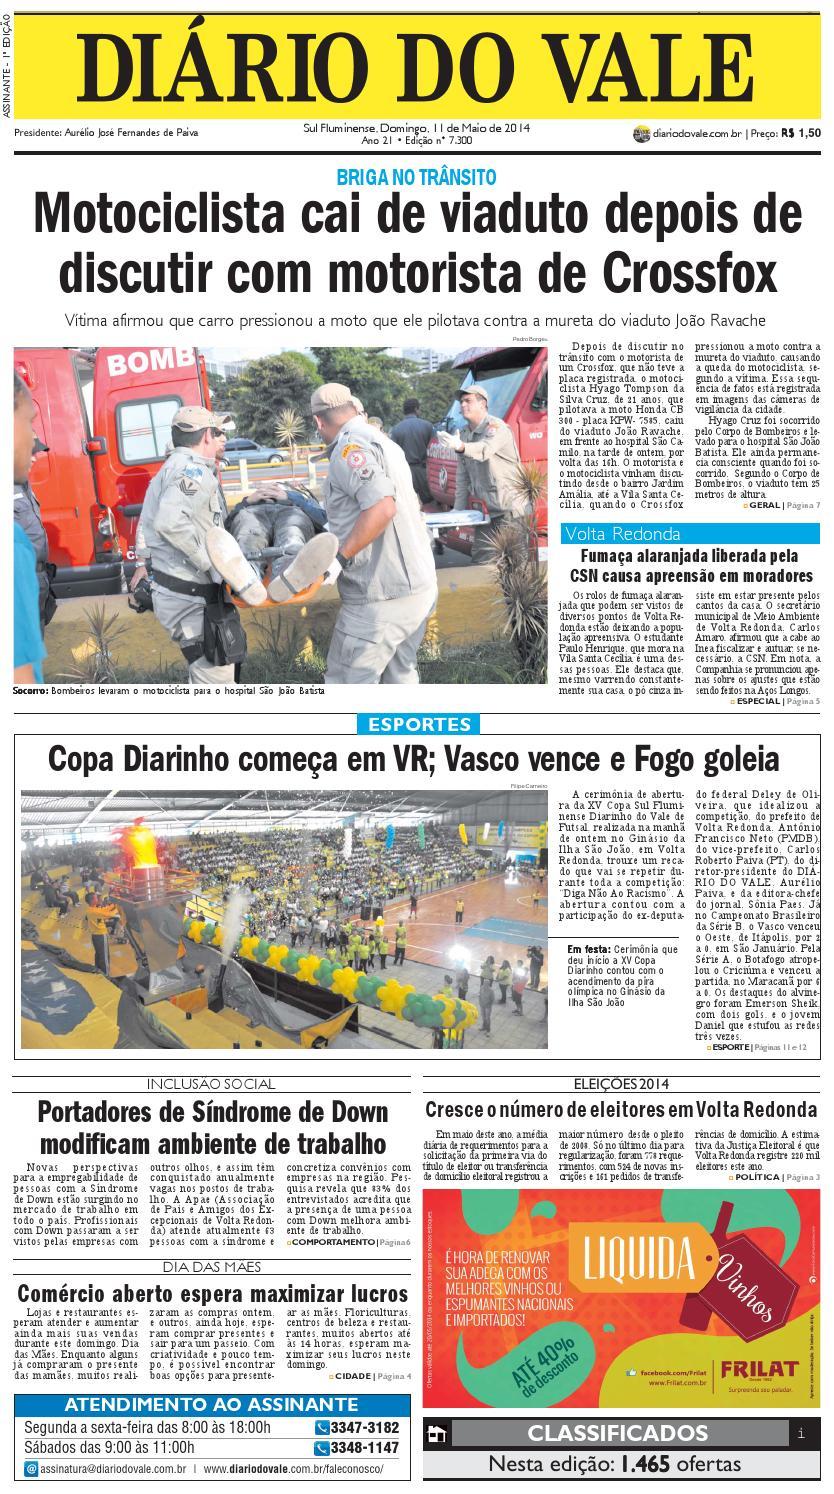 Completo 7300 diario domingo 11 05 2014 by Diário do Vale - issuu 3b5ea994e4f